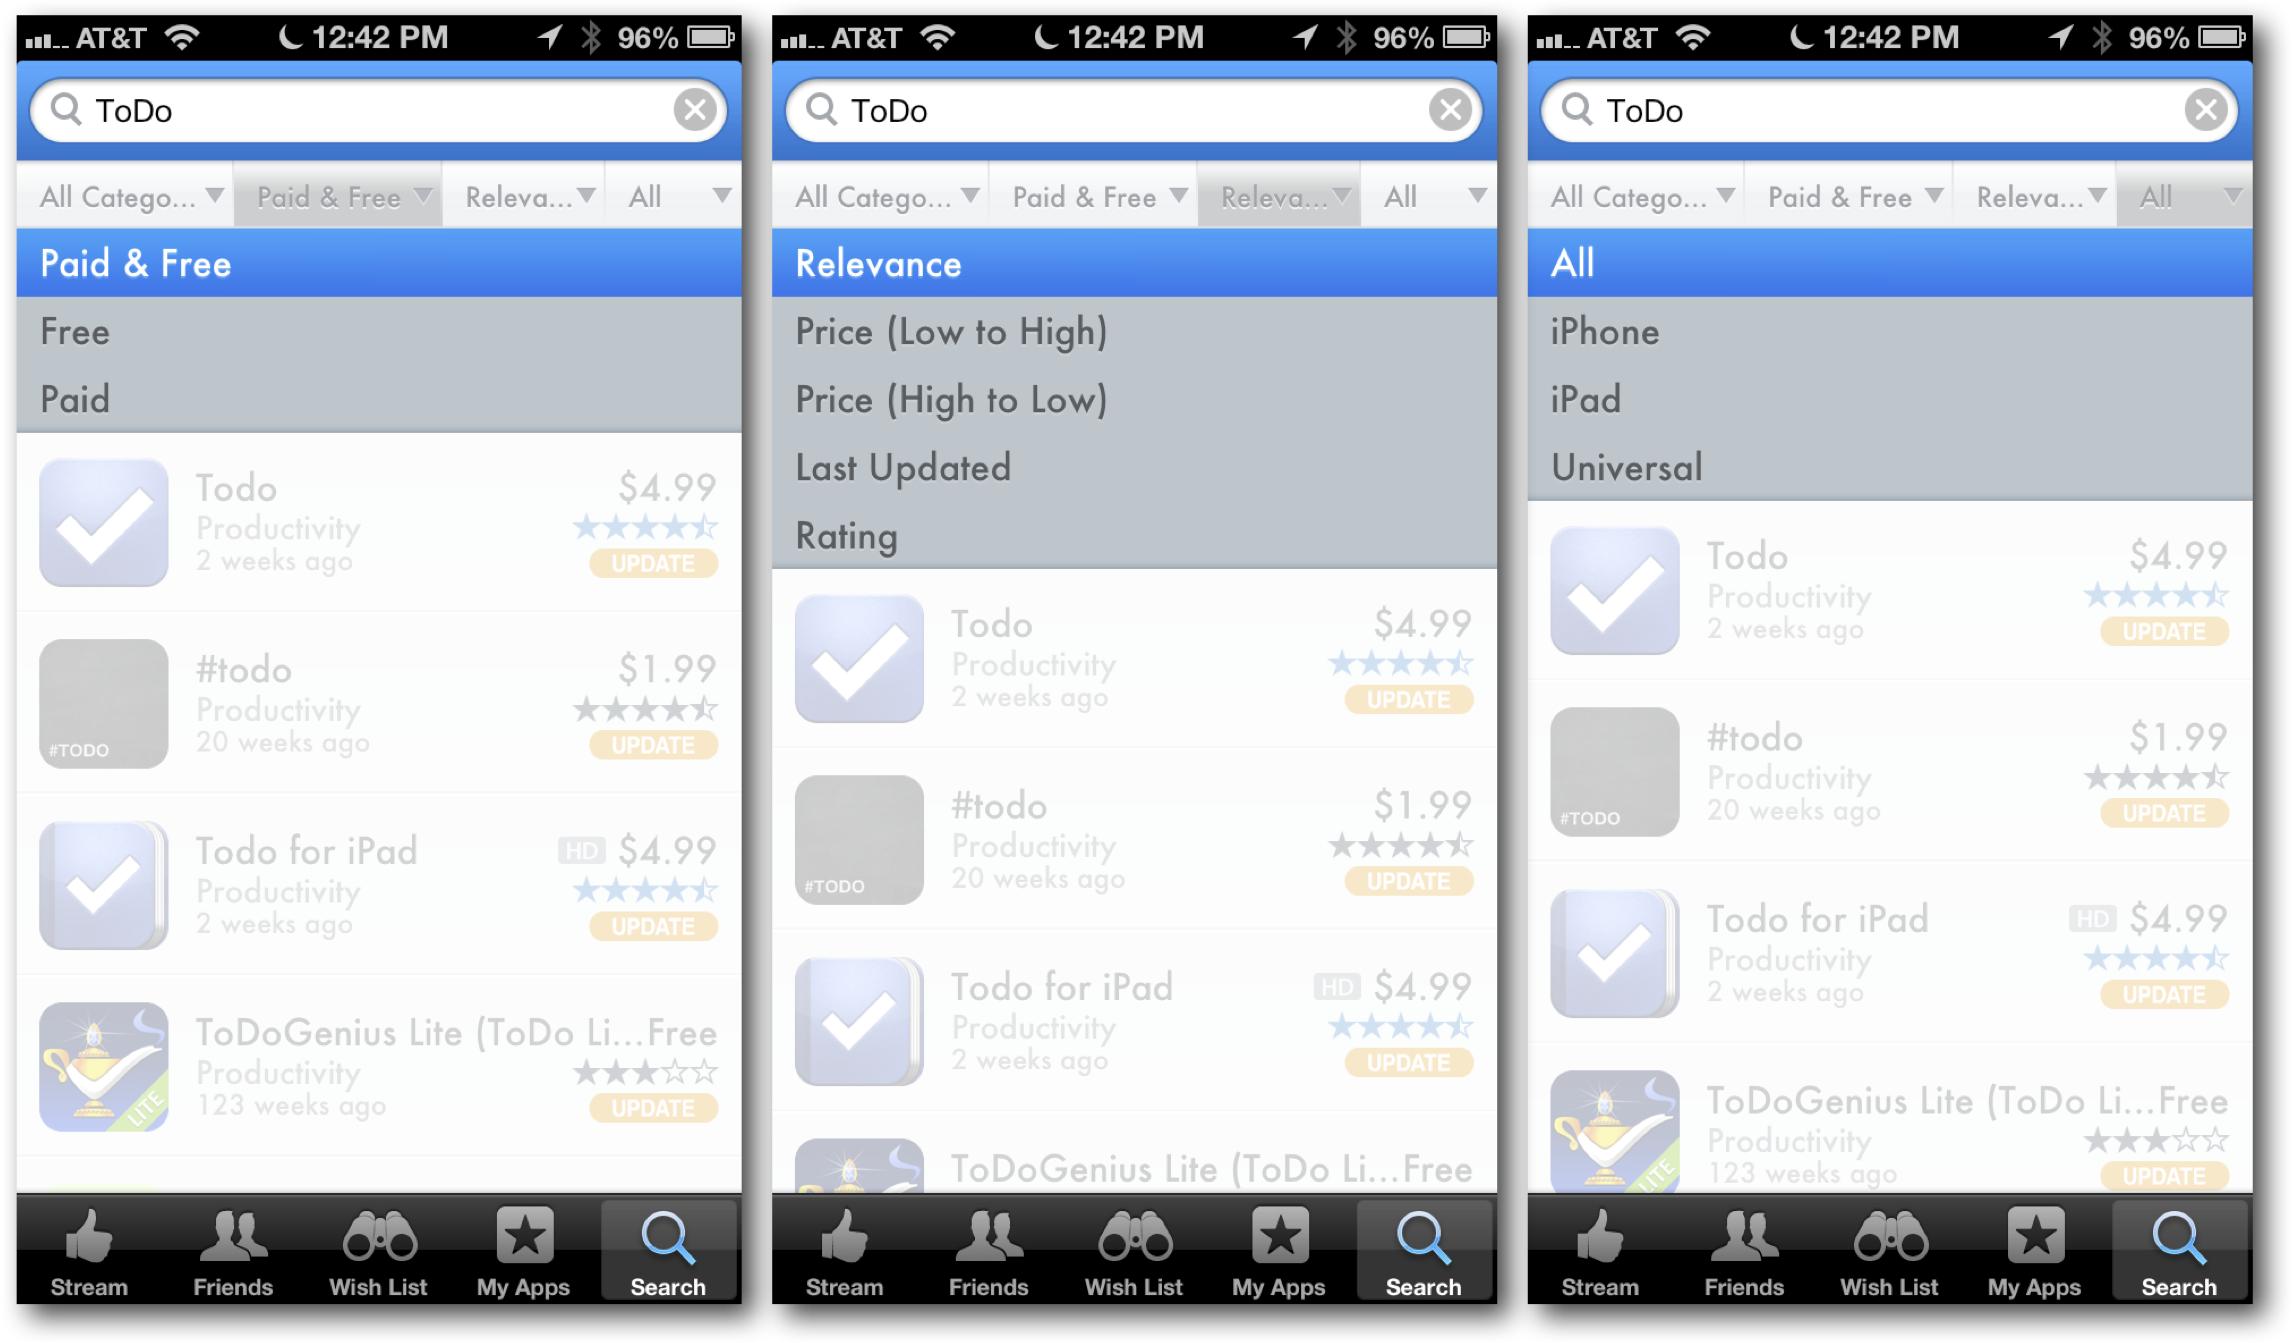 AppShopper Search